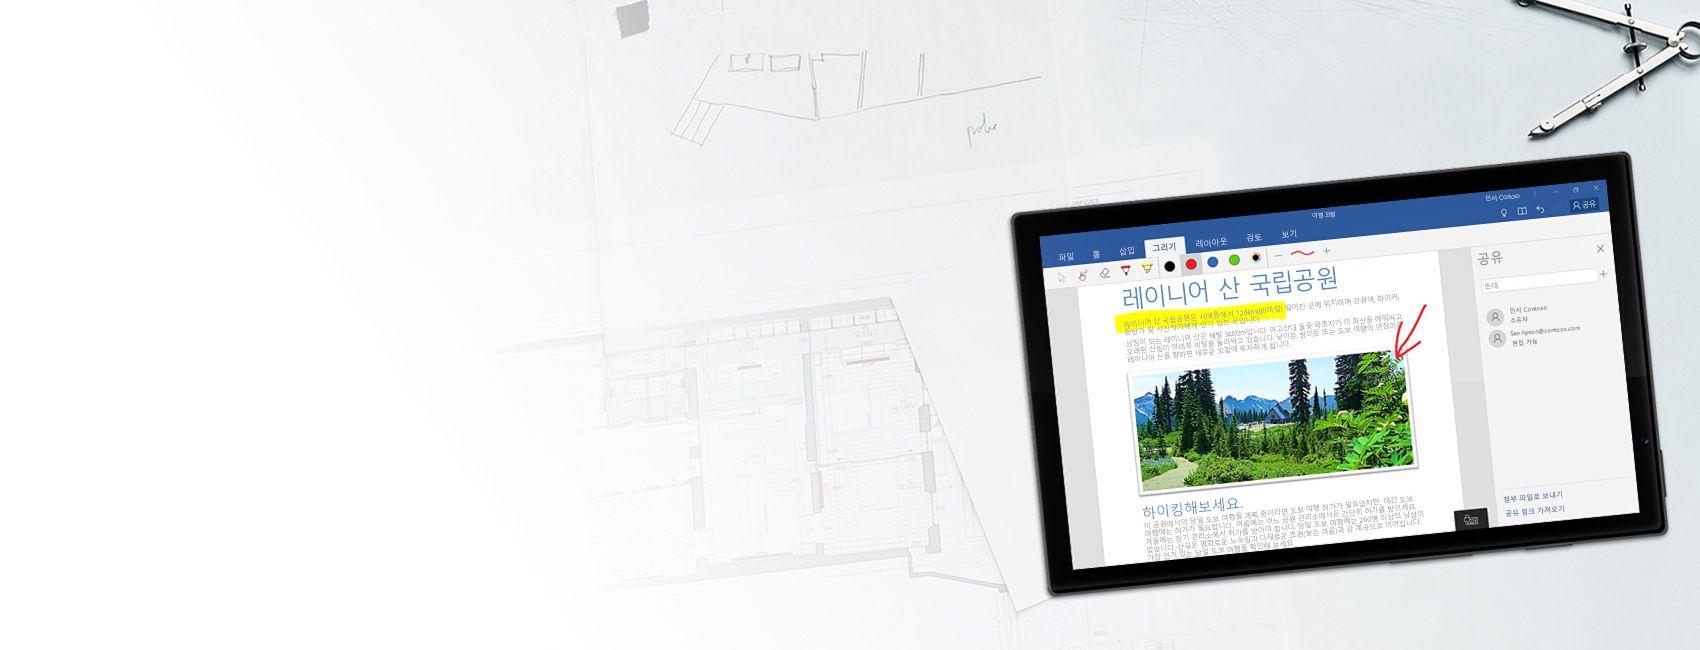 Windows 10 Mobile용 Word에 레이니어 산 국립공원에 대한 Word 문서가 표시된 Windows 태블릿